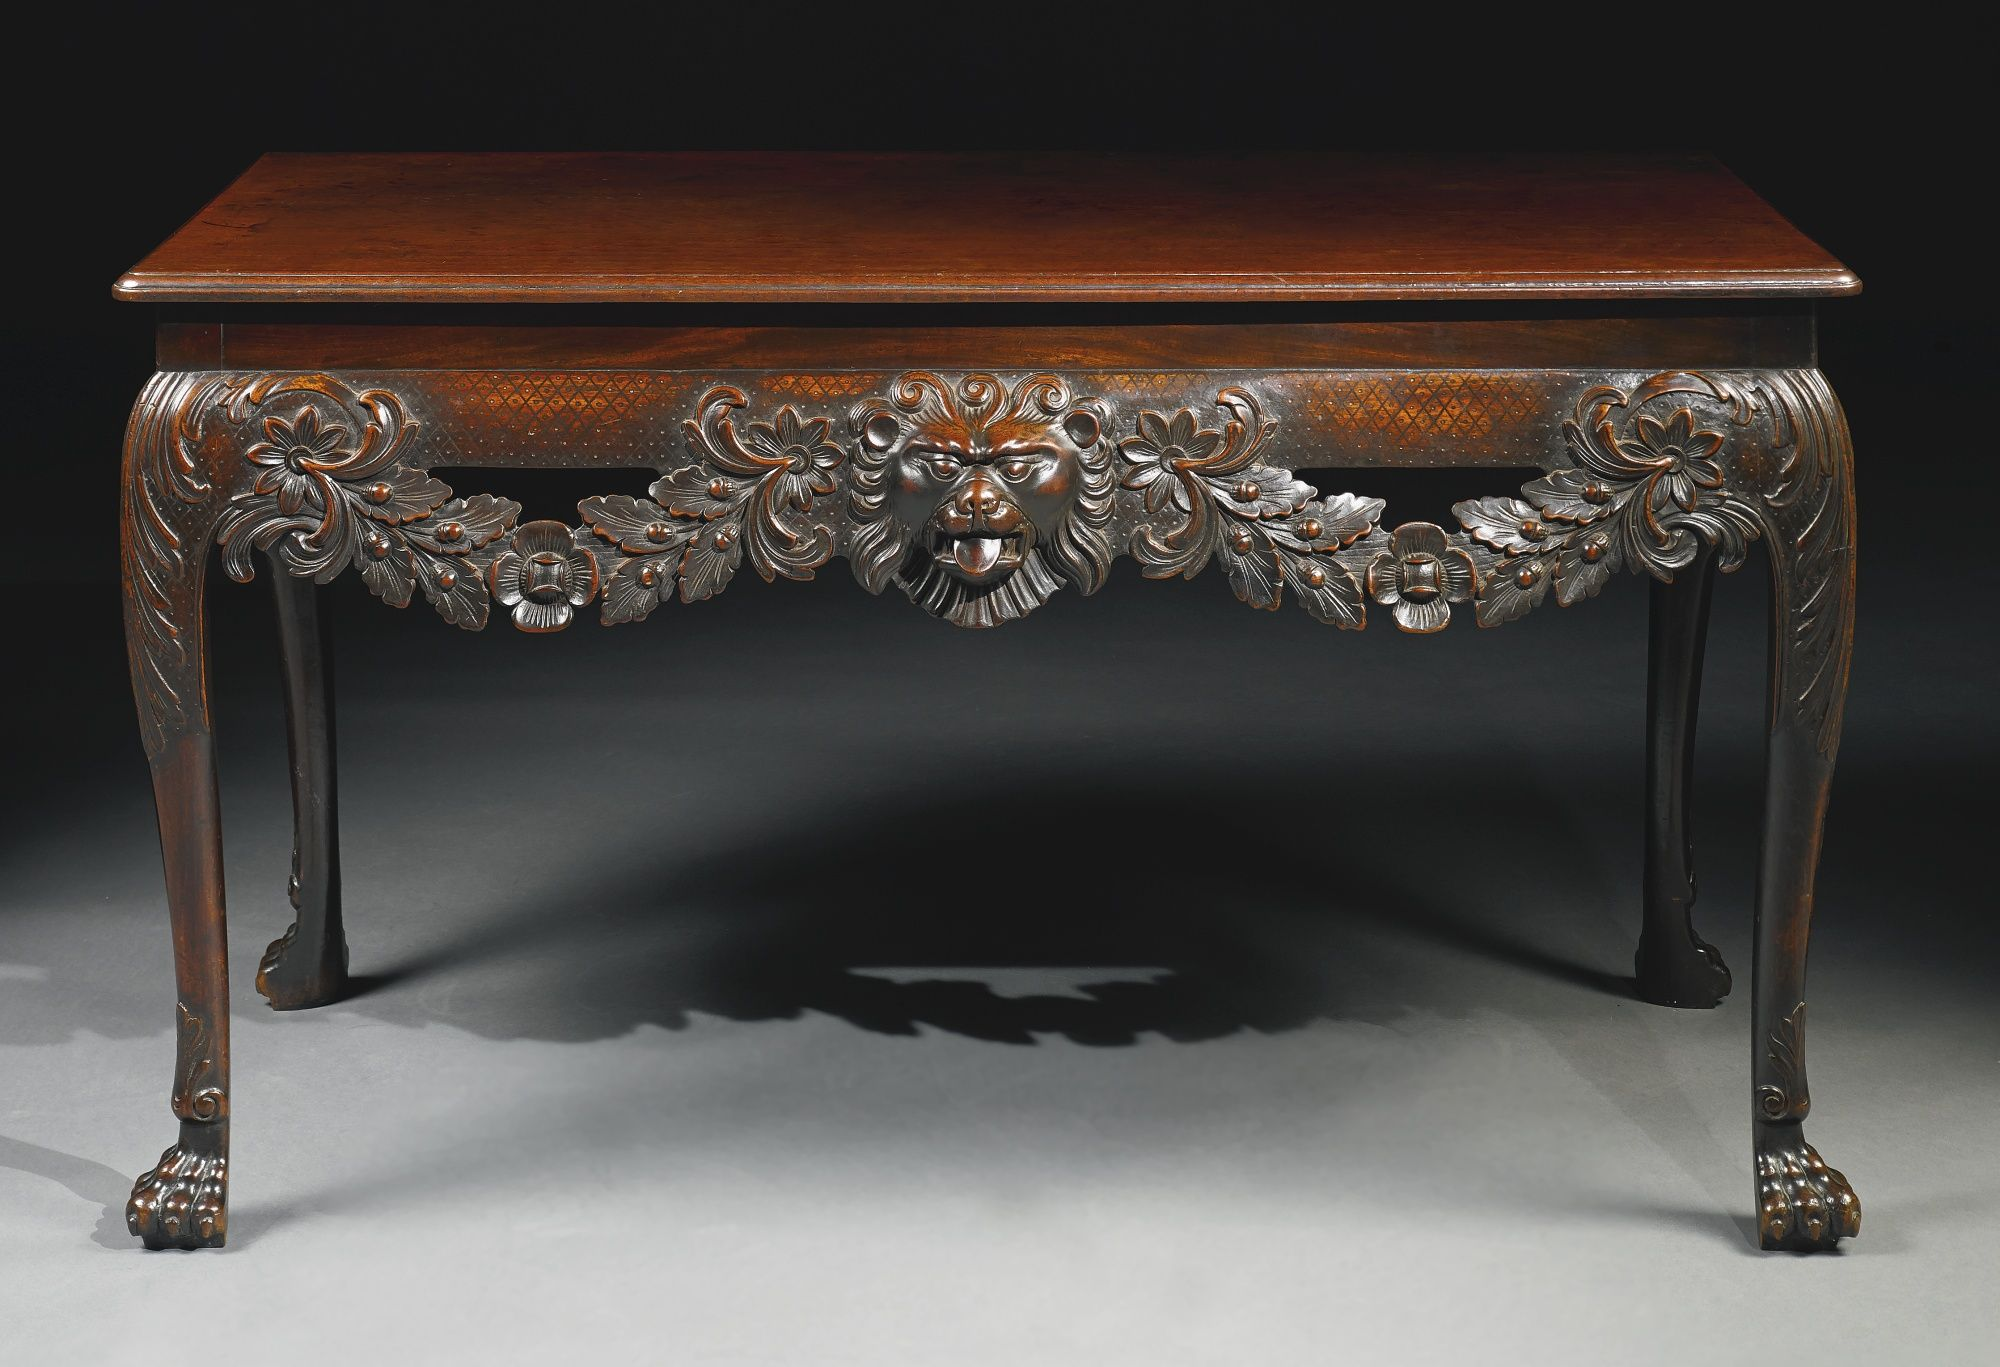 Mid century wheat sheaf coffee table irish antique dealers - An Important Irish George Ii Mahogany Side Table Circa 1755 Rectangular Figured Top With